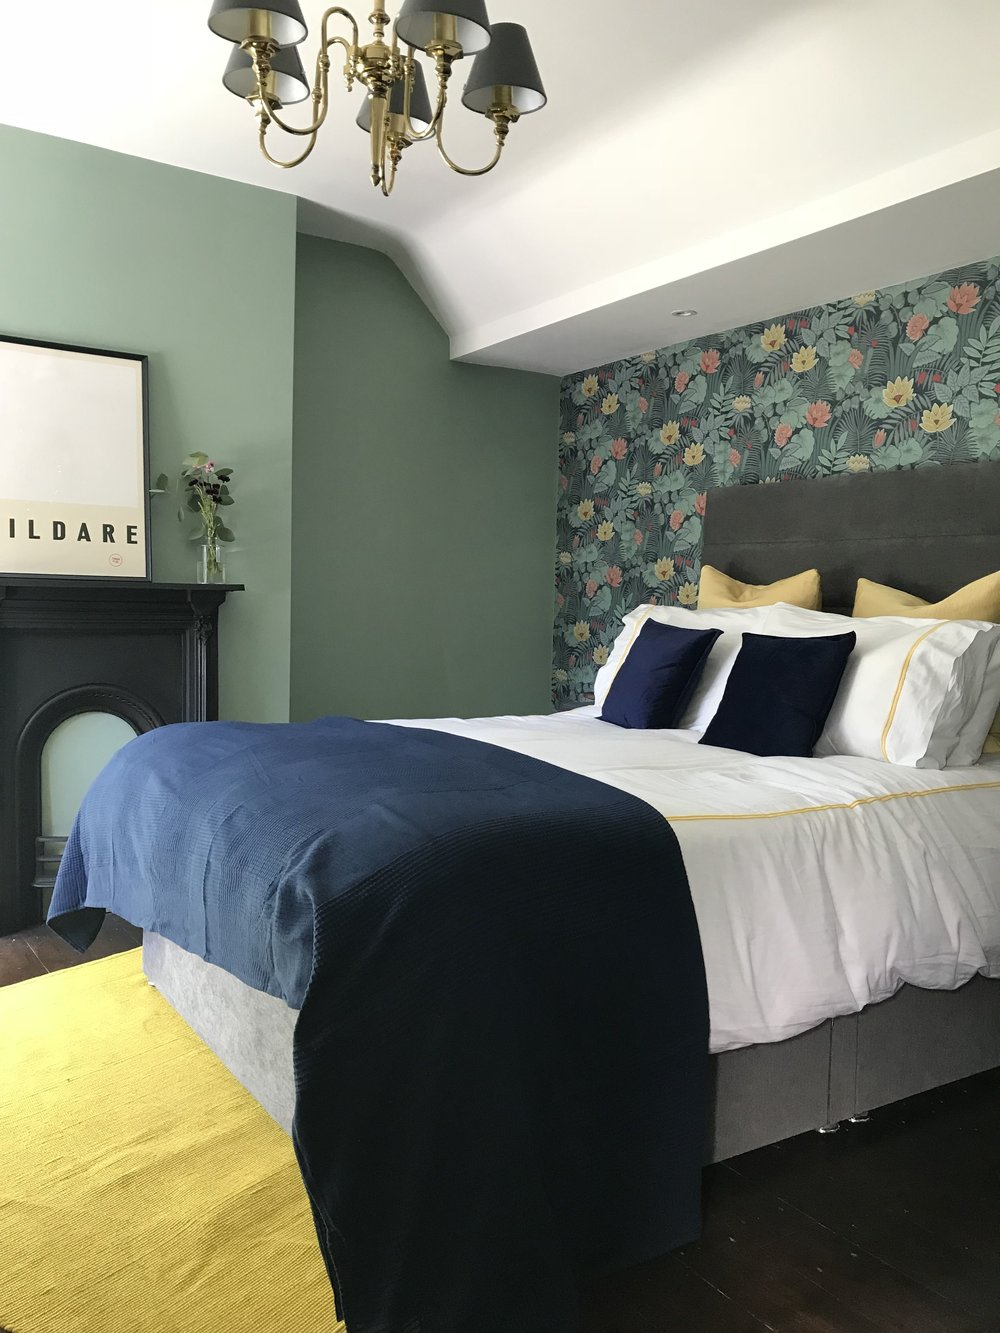 Bedroom_After copy.jpg